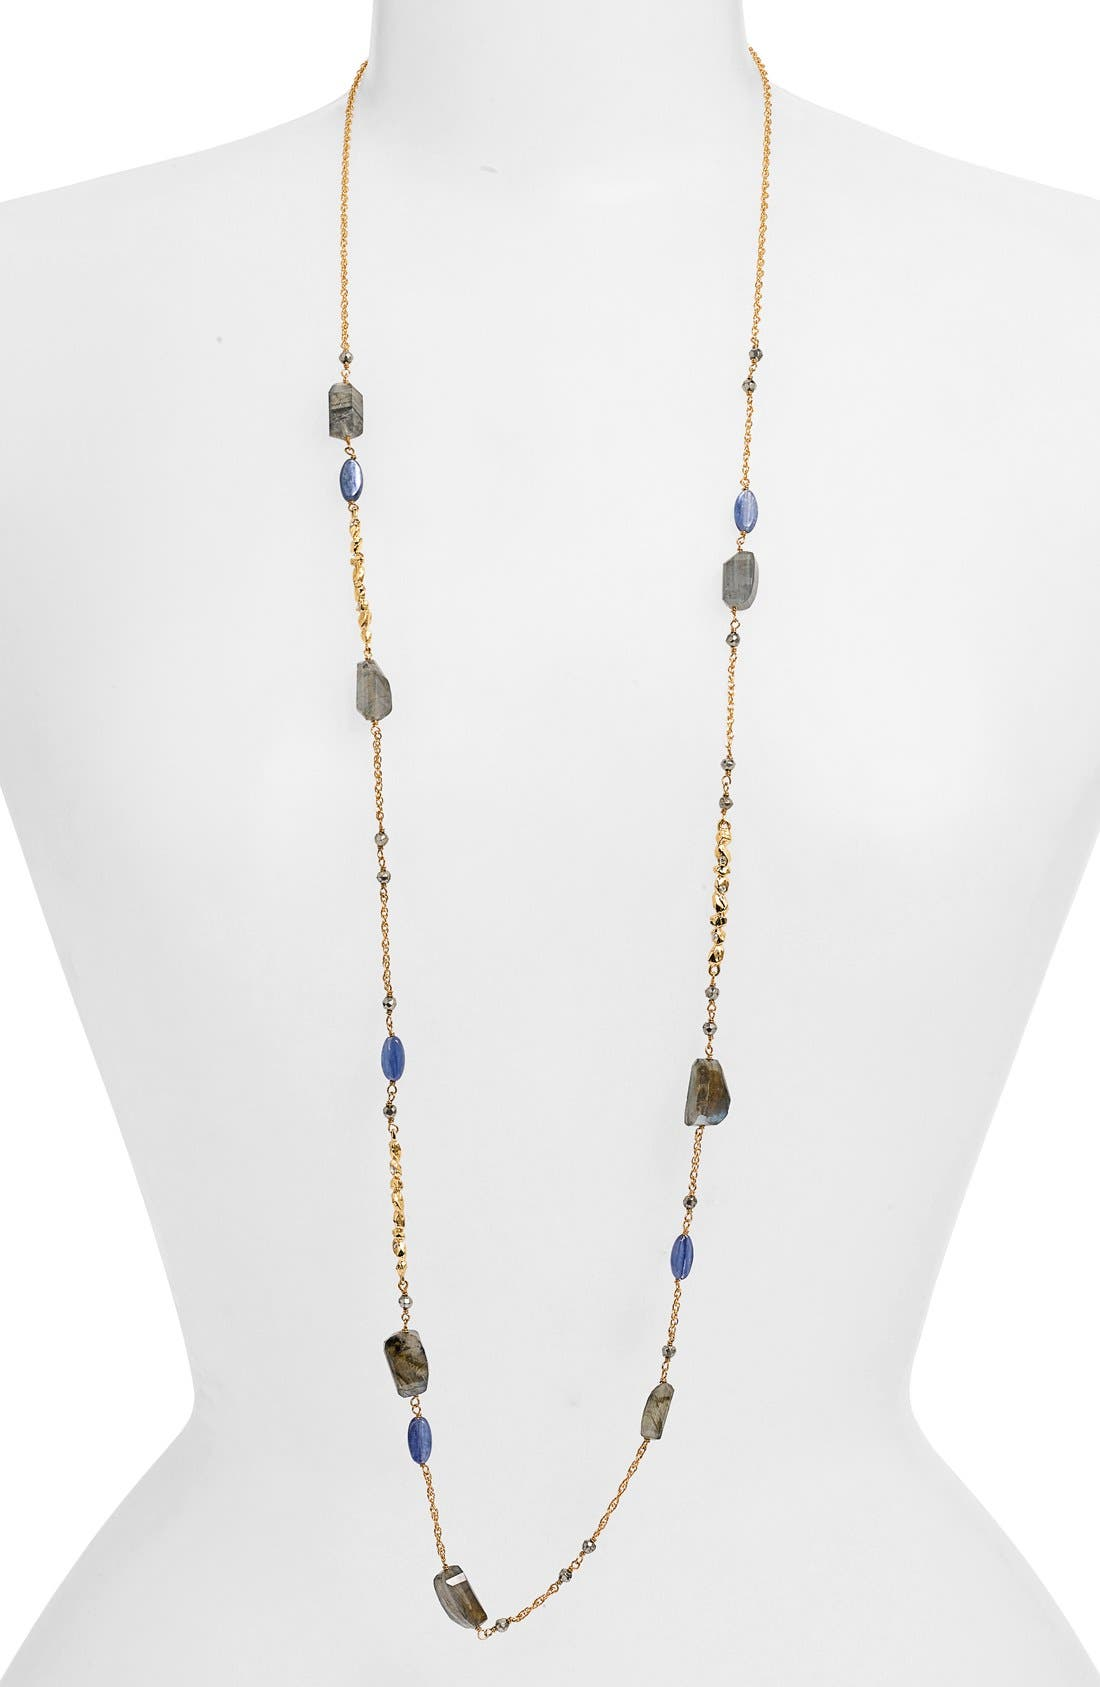 Main Image - Alexis Bittar 'Elements - Phoenix' Long Station Necklace